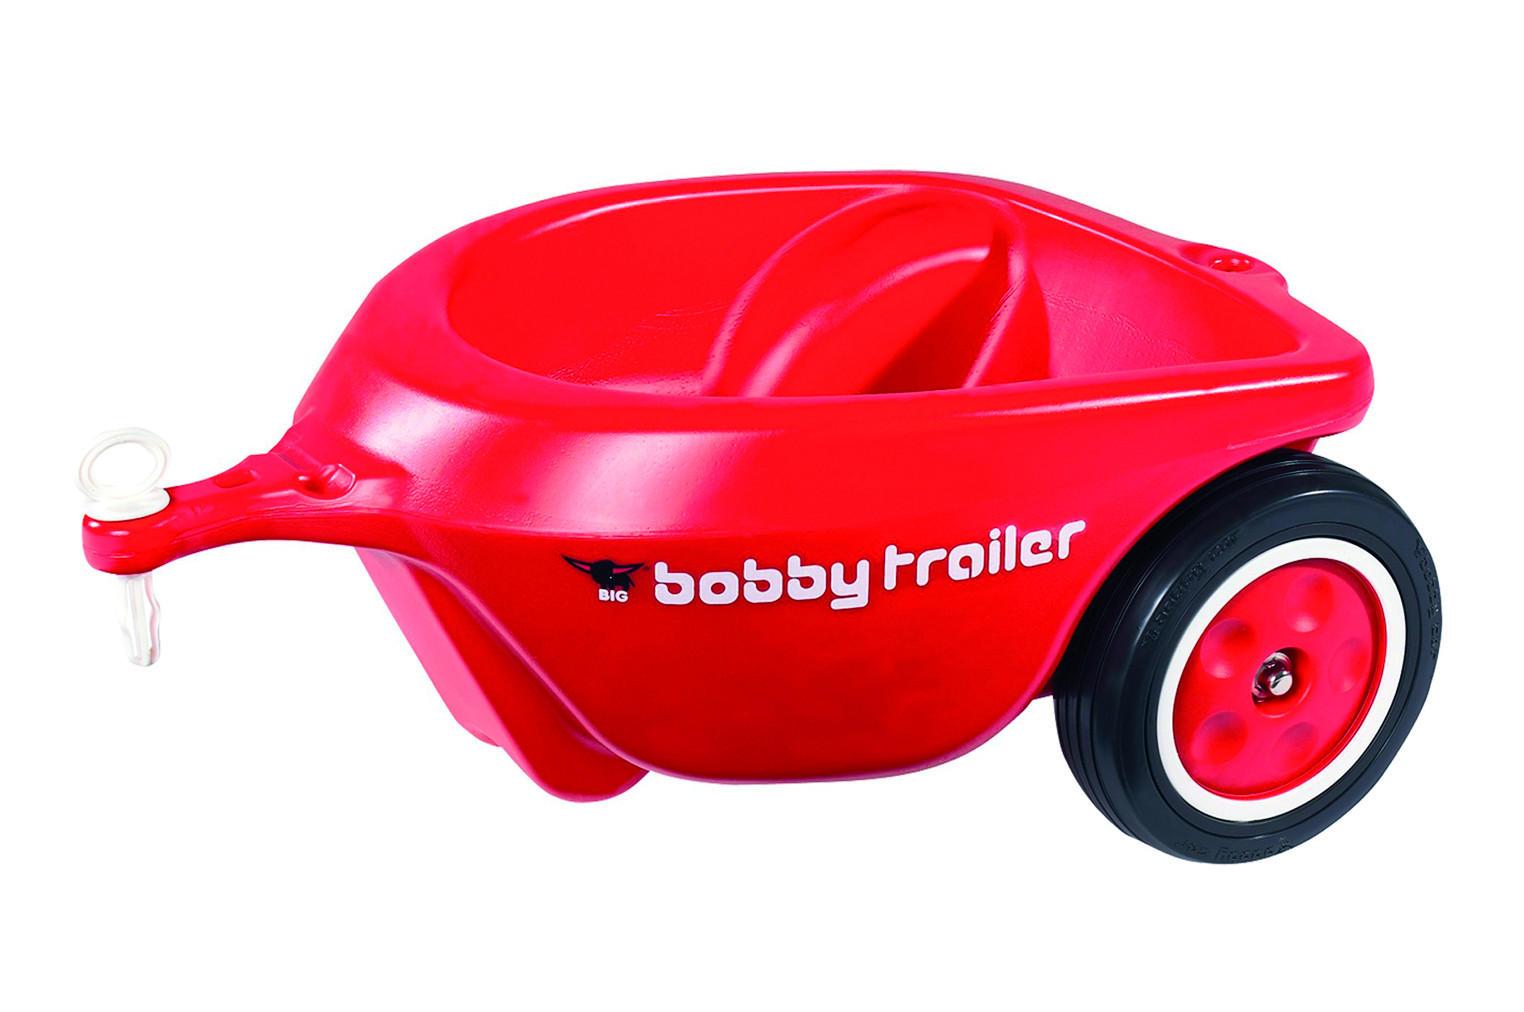 rot üBereinstimmung In Farbe Bobby Car